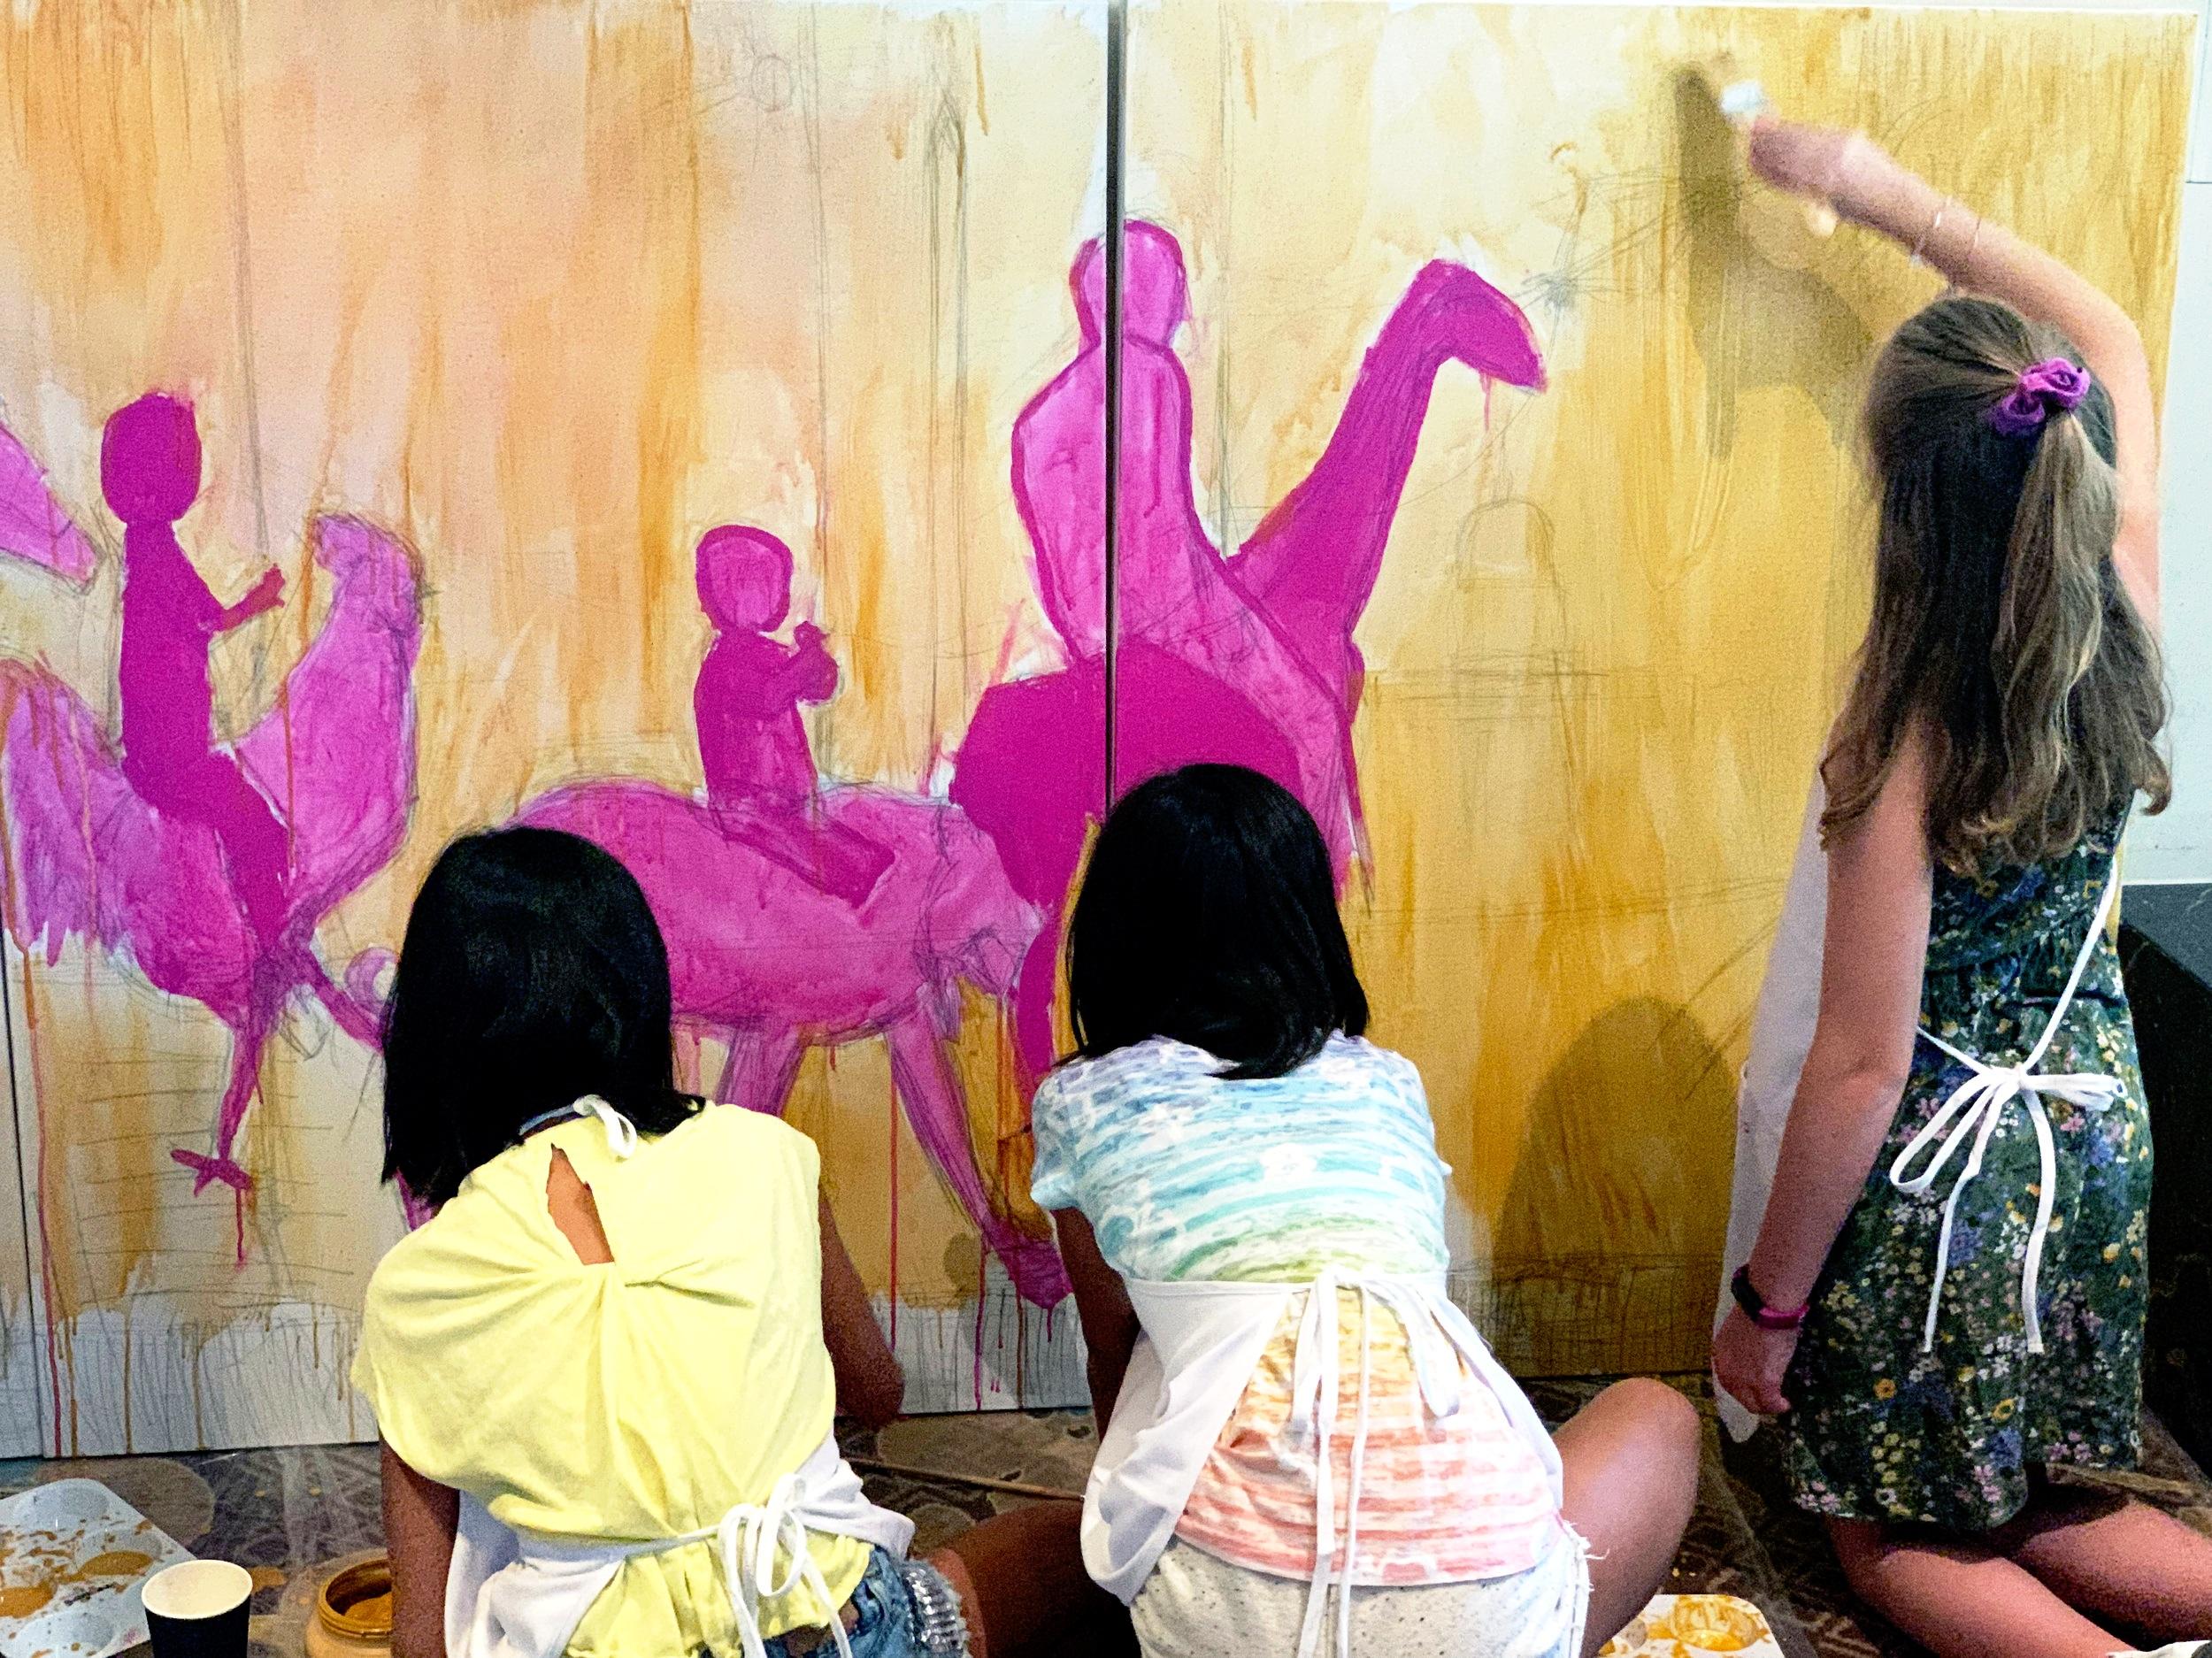 Mural-FourSeasons-DC-Swirl-HotelatPlay.jpg